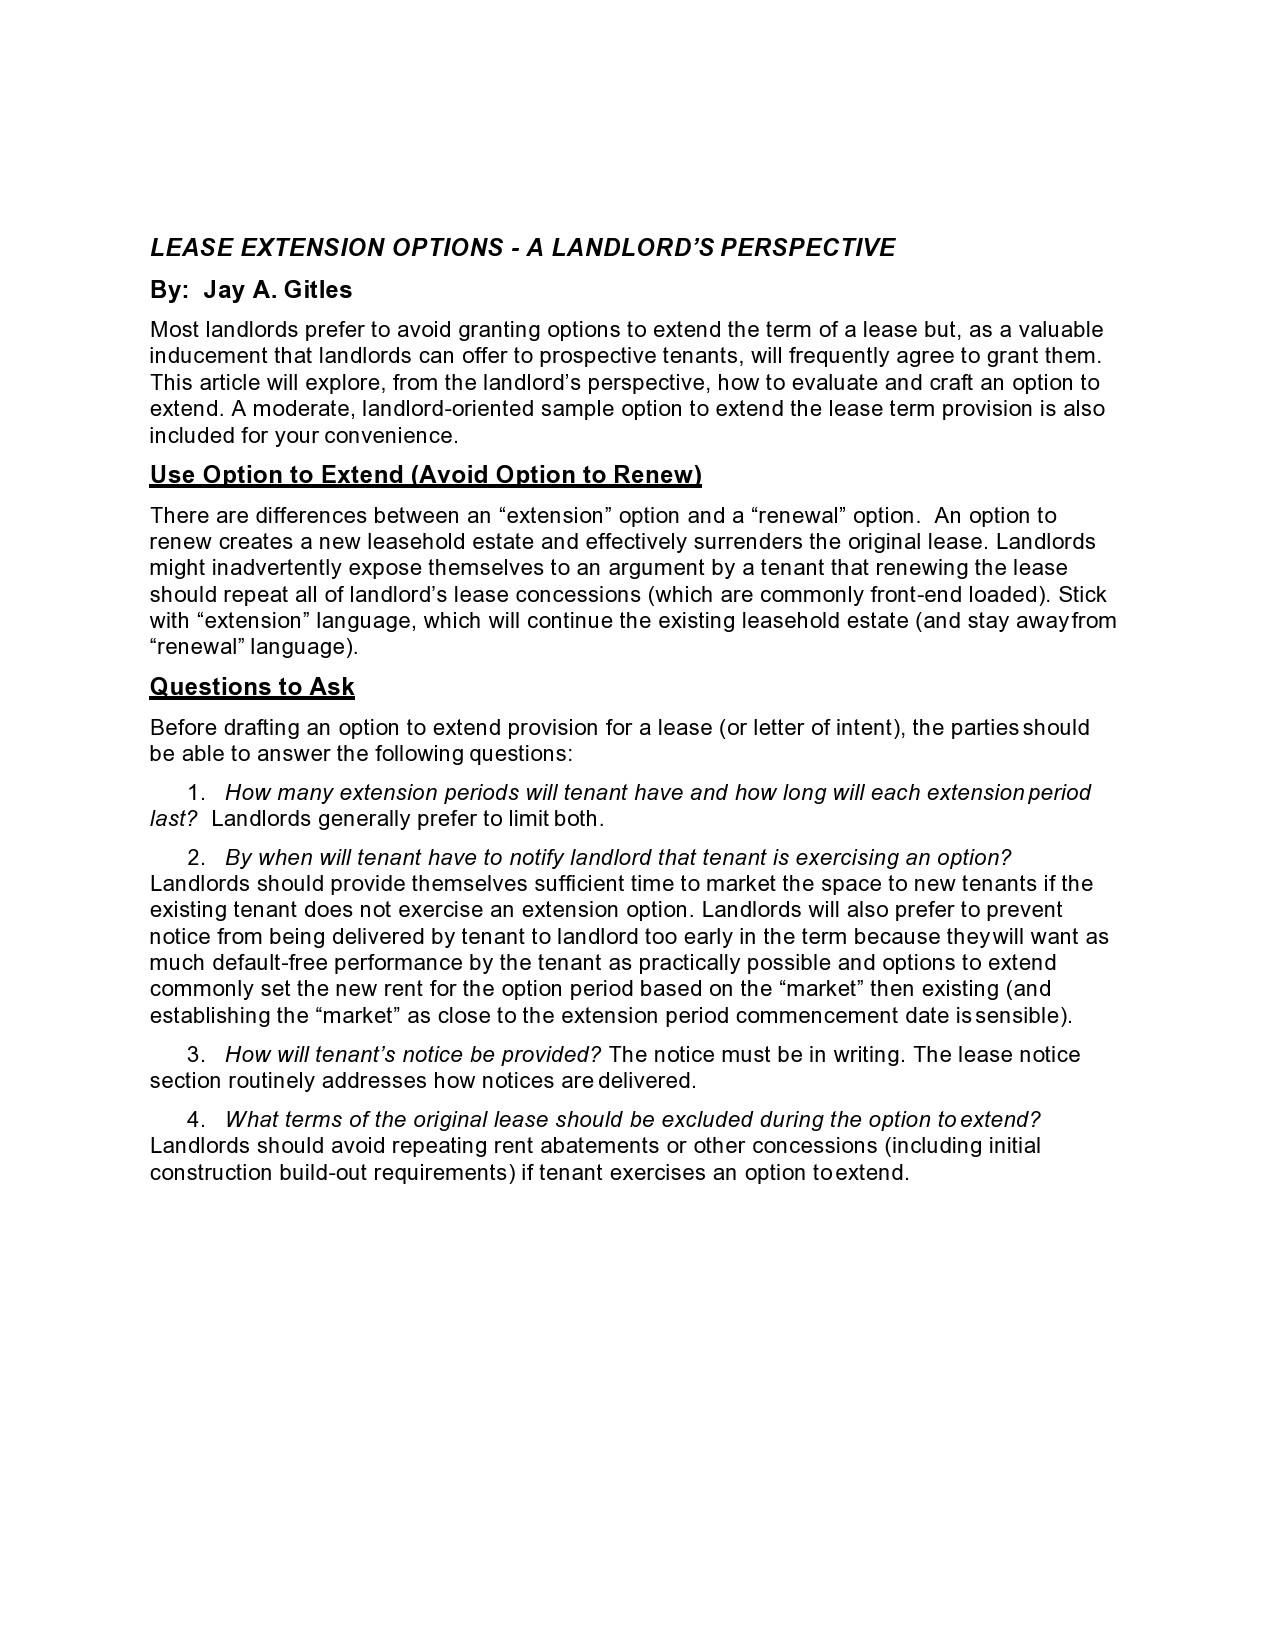 Free lease extension addendum 15